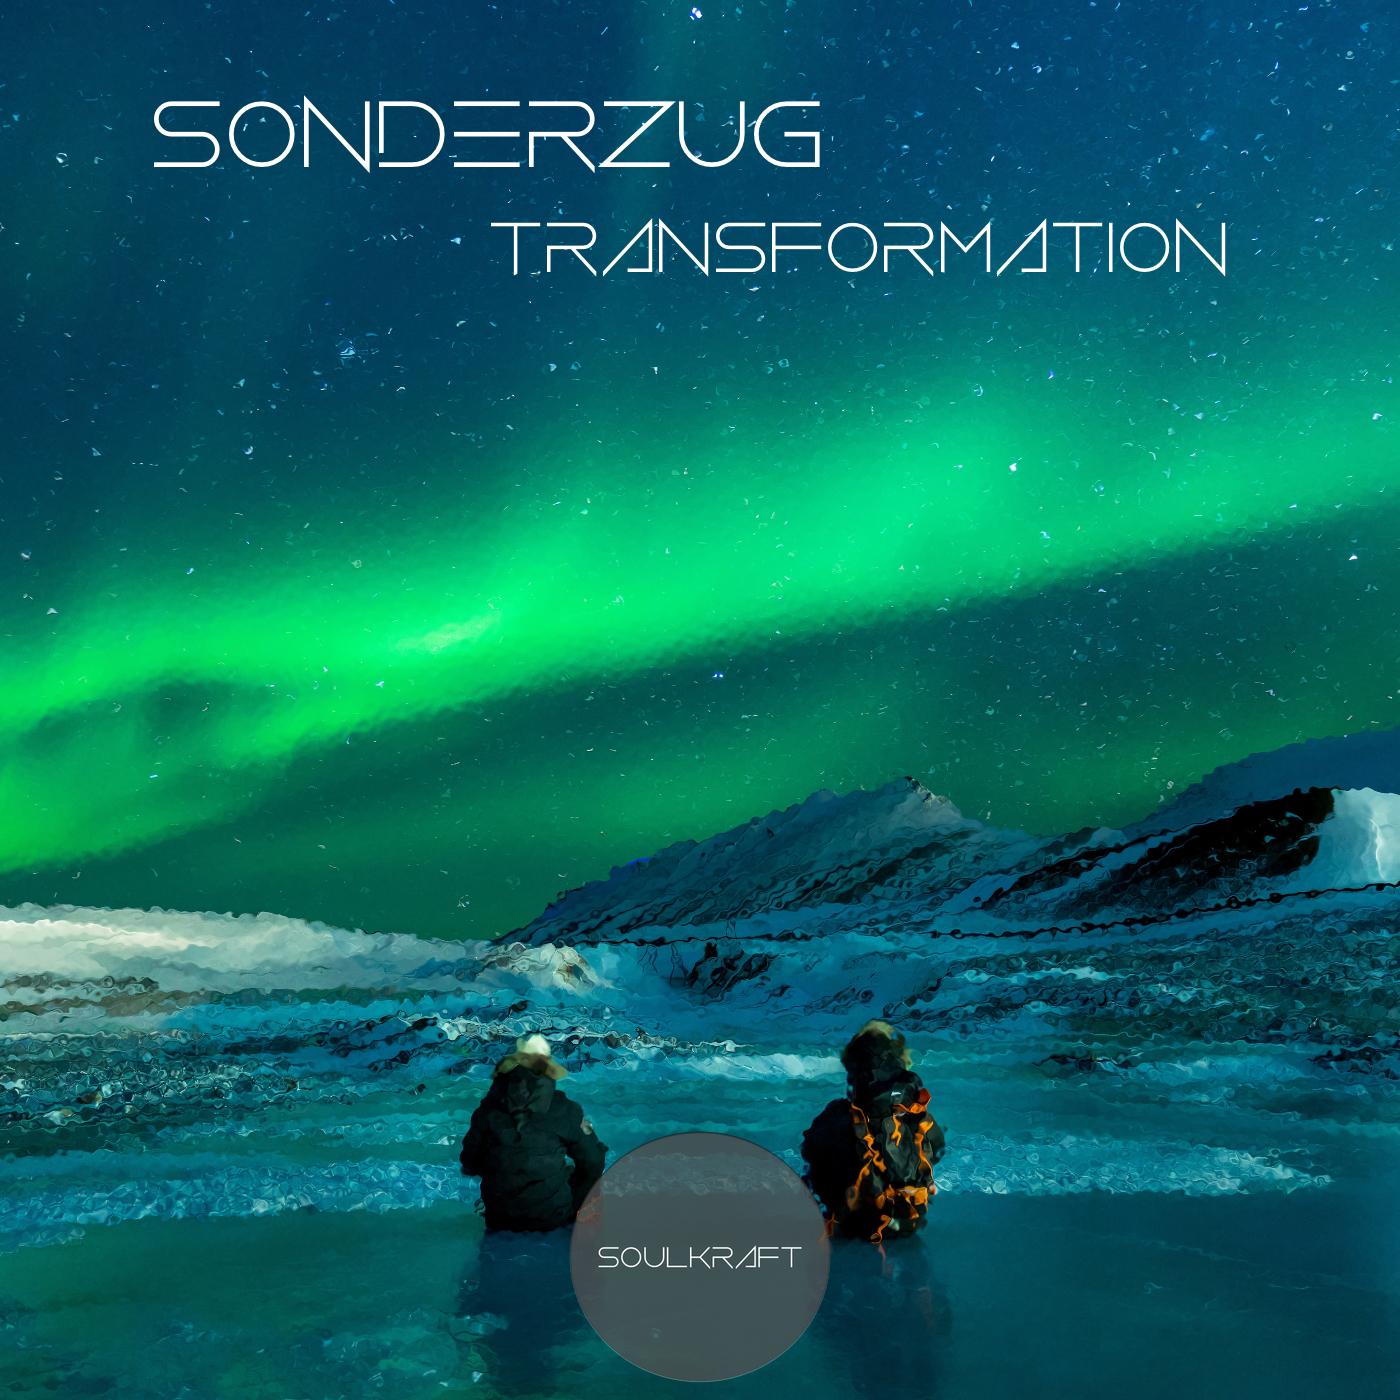 Sonderzug - Transformation (Soulkraft)